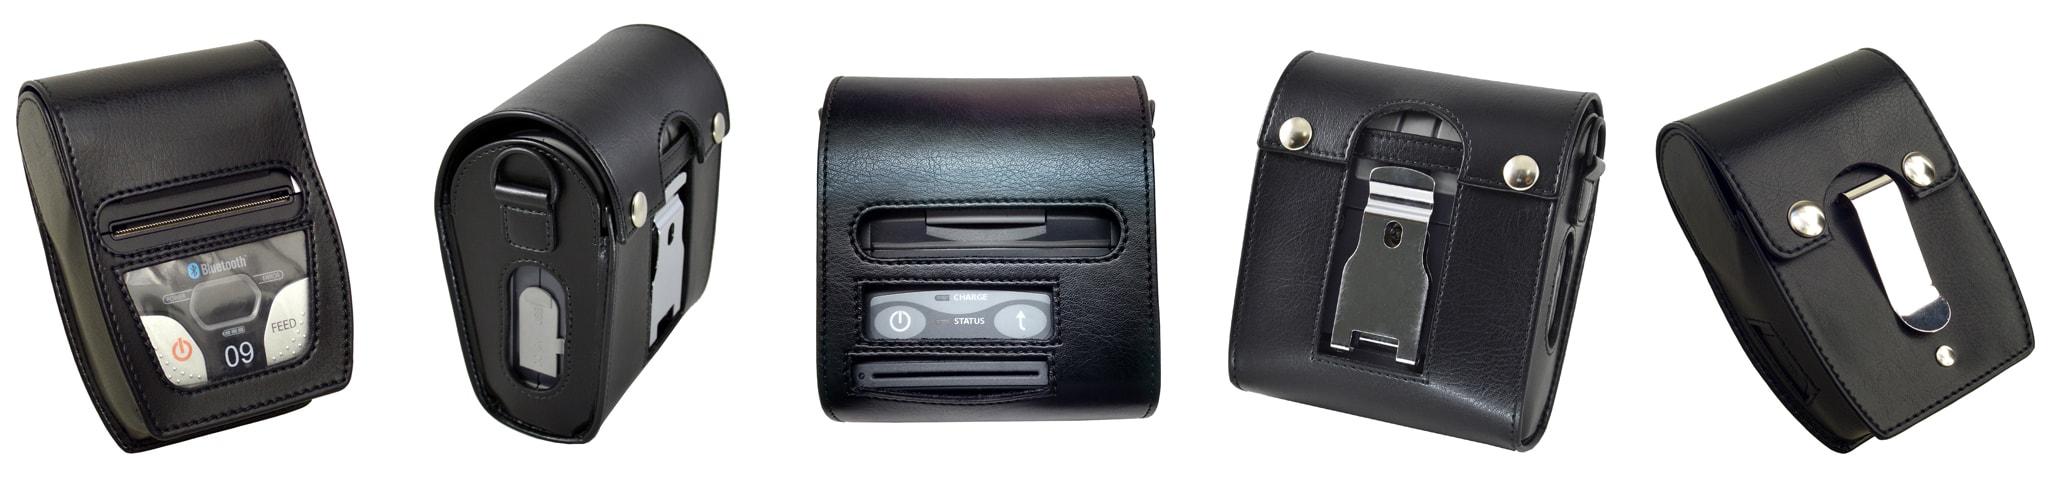 Mobile Printer Case Industrial